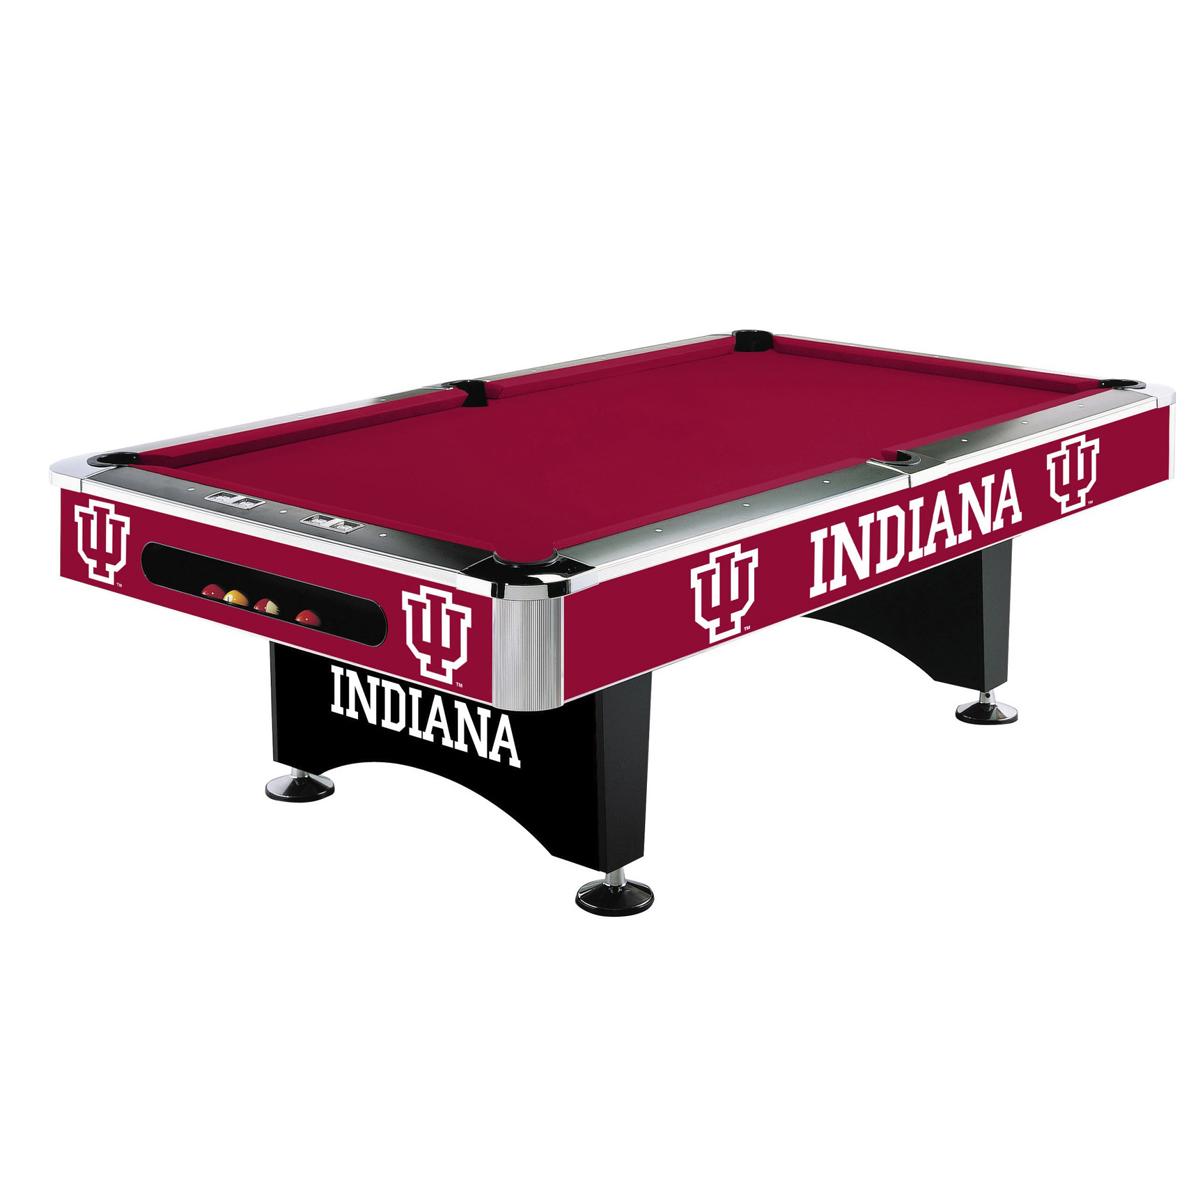 INDIANA UNIVERSITY 8-FT. POOL TABLE